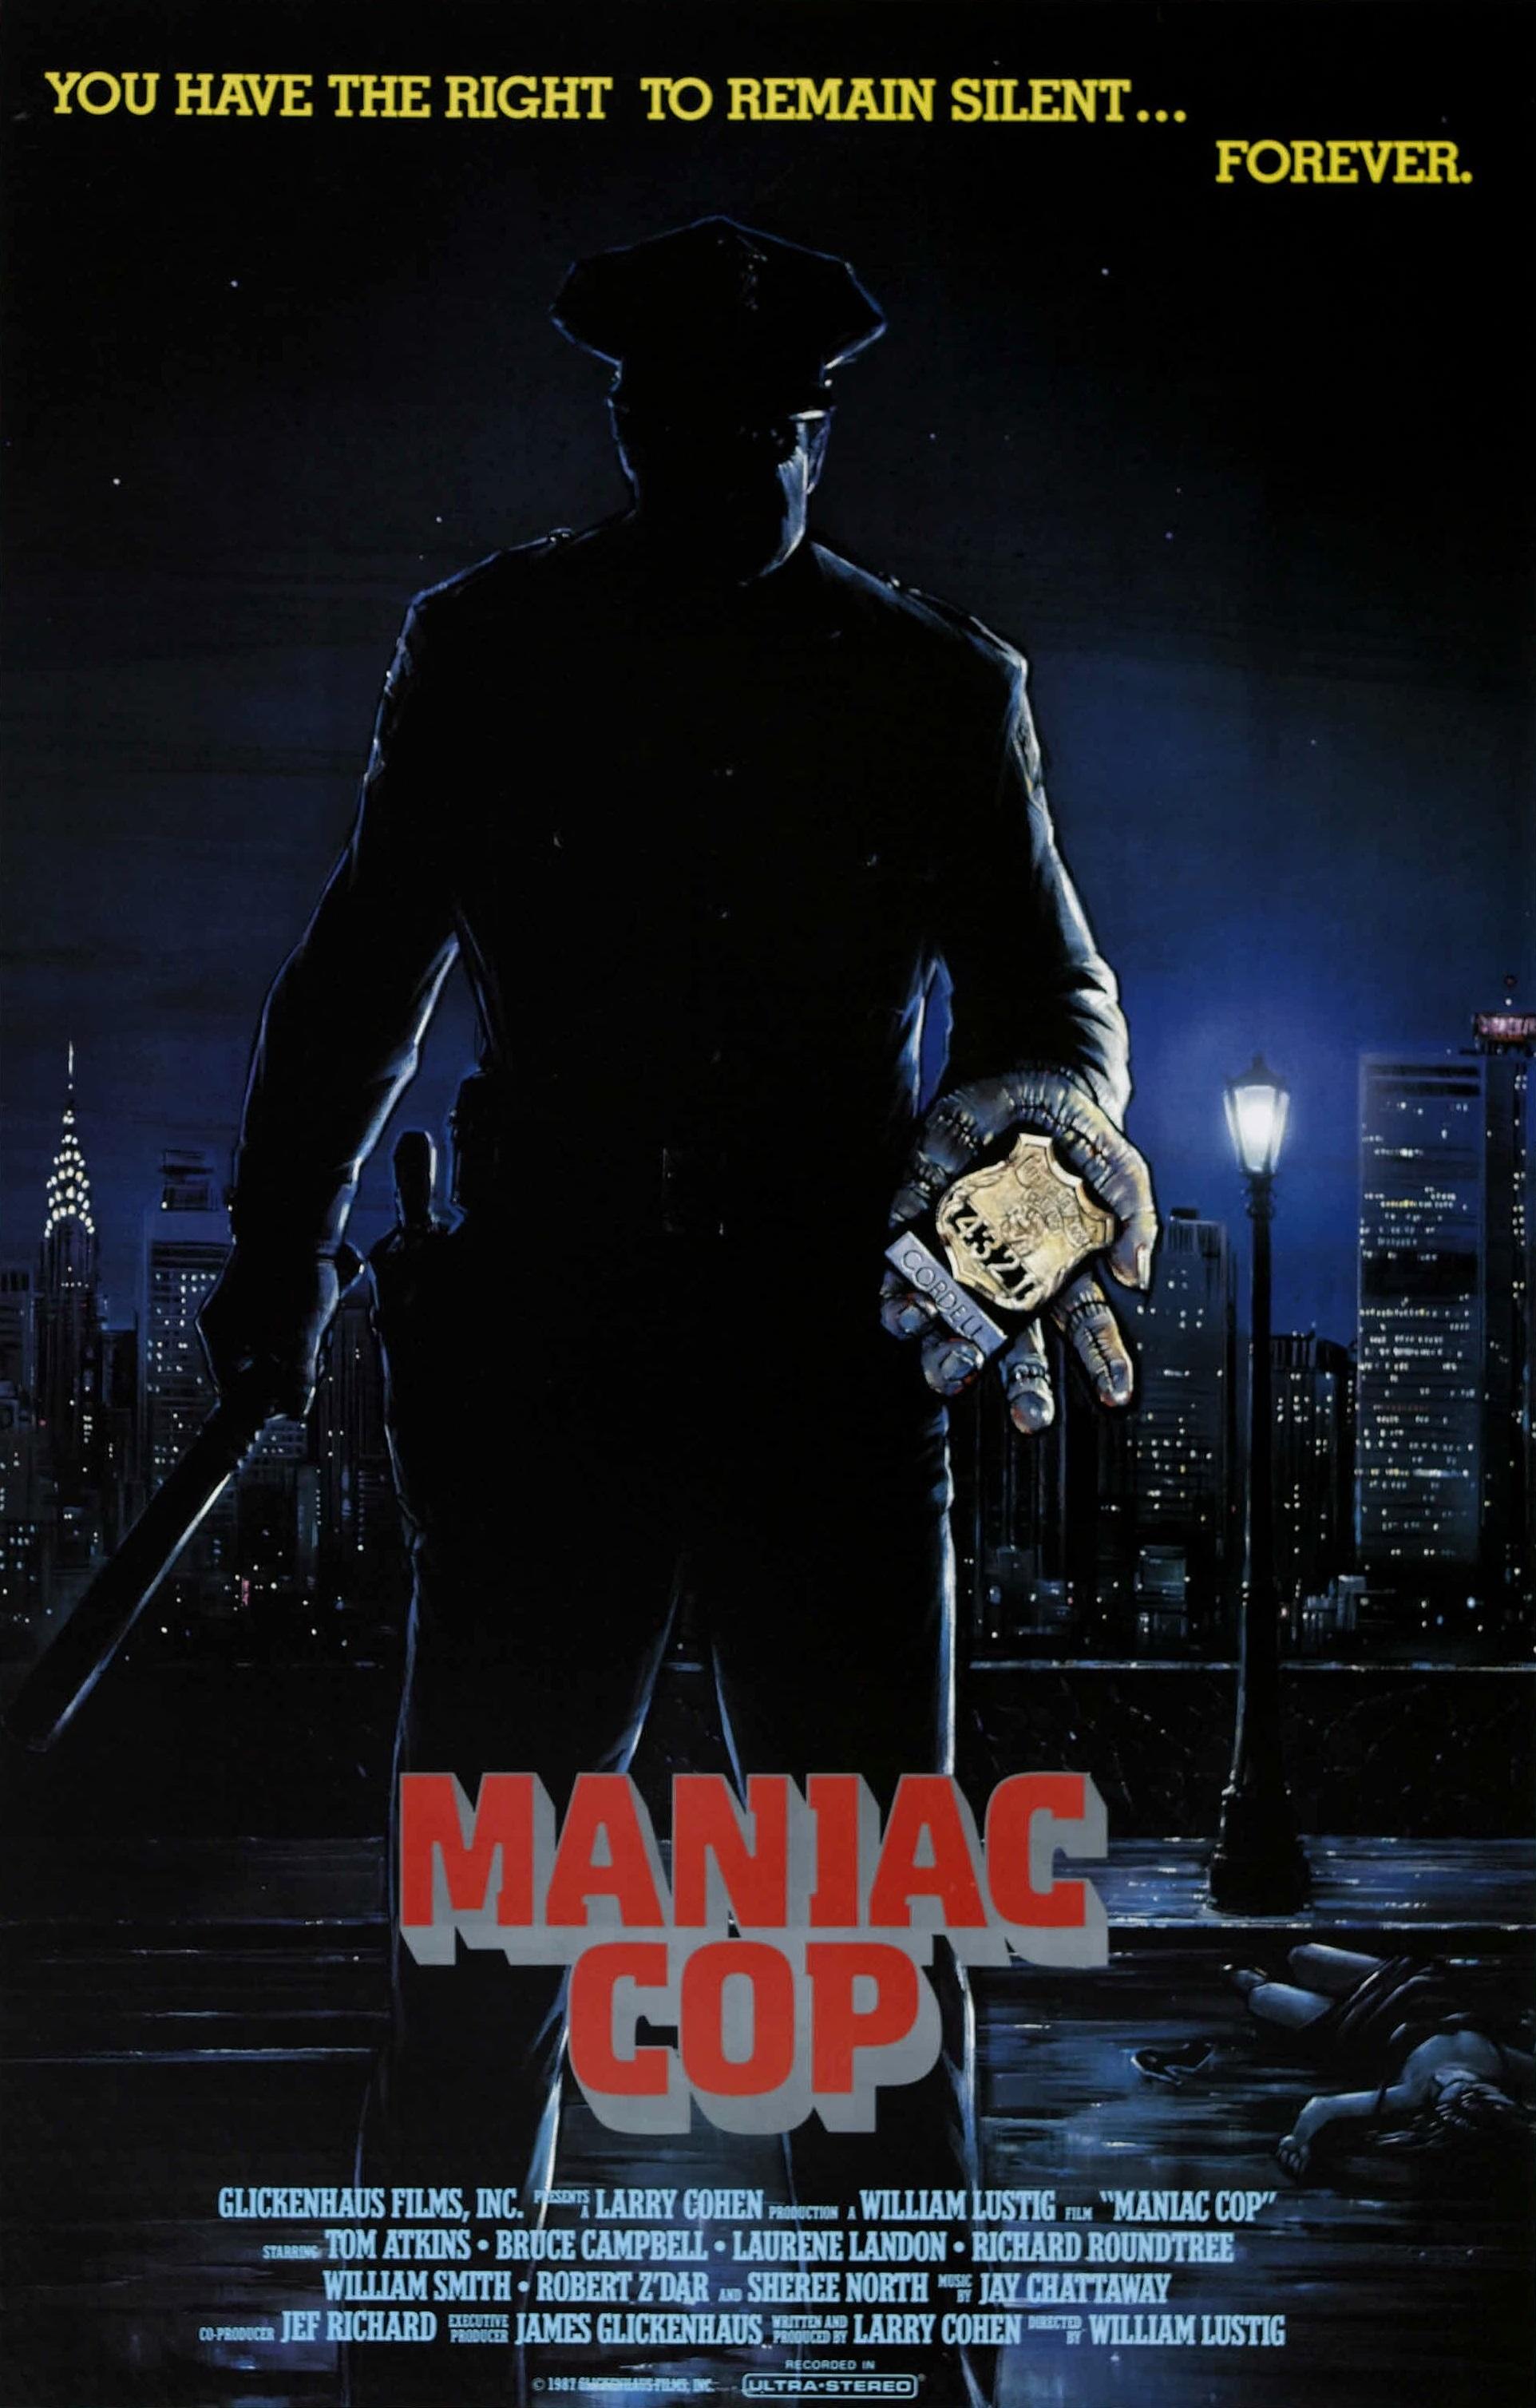 maniac_cop_poster.jpg